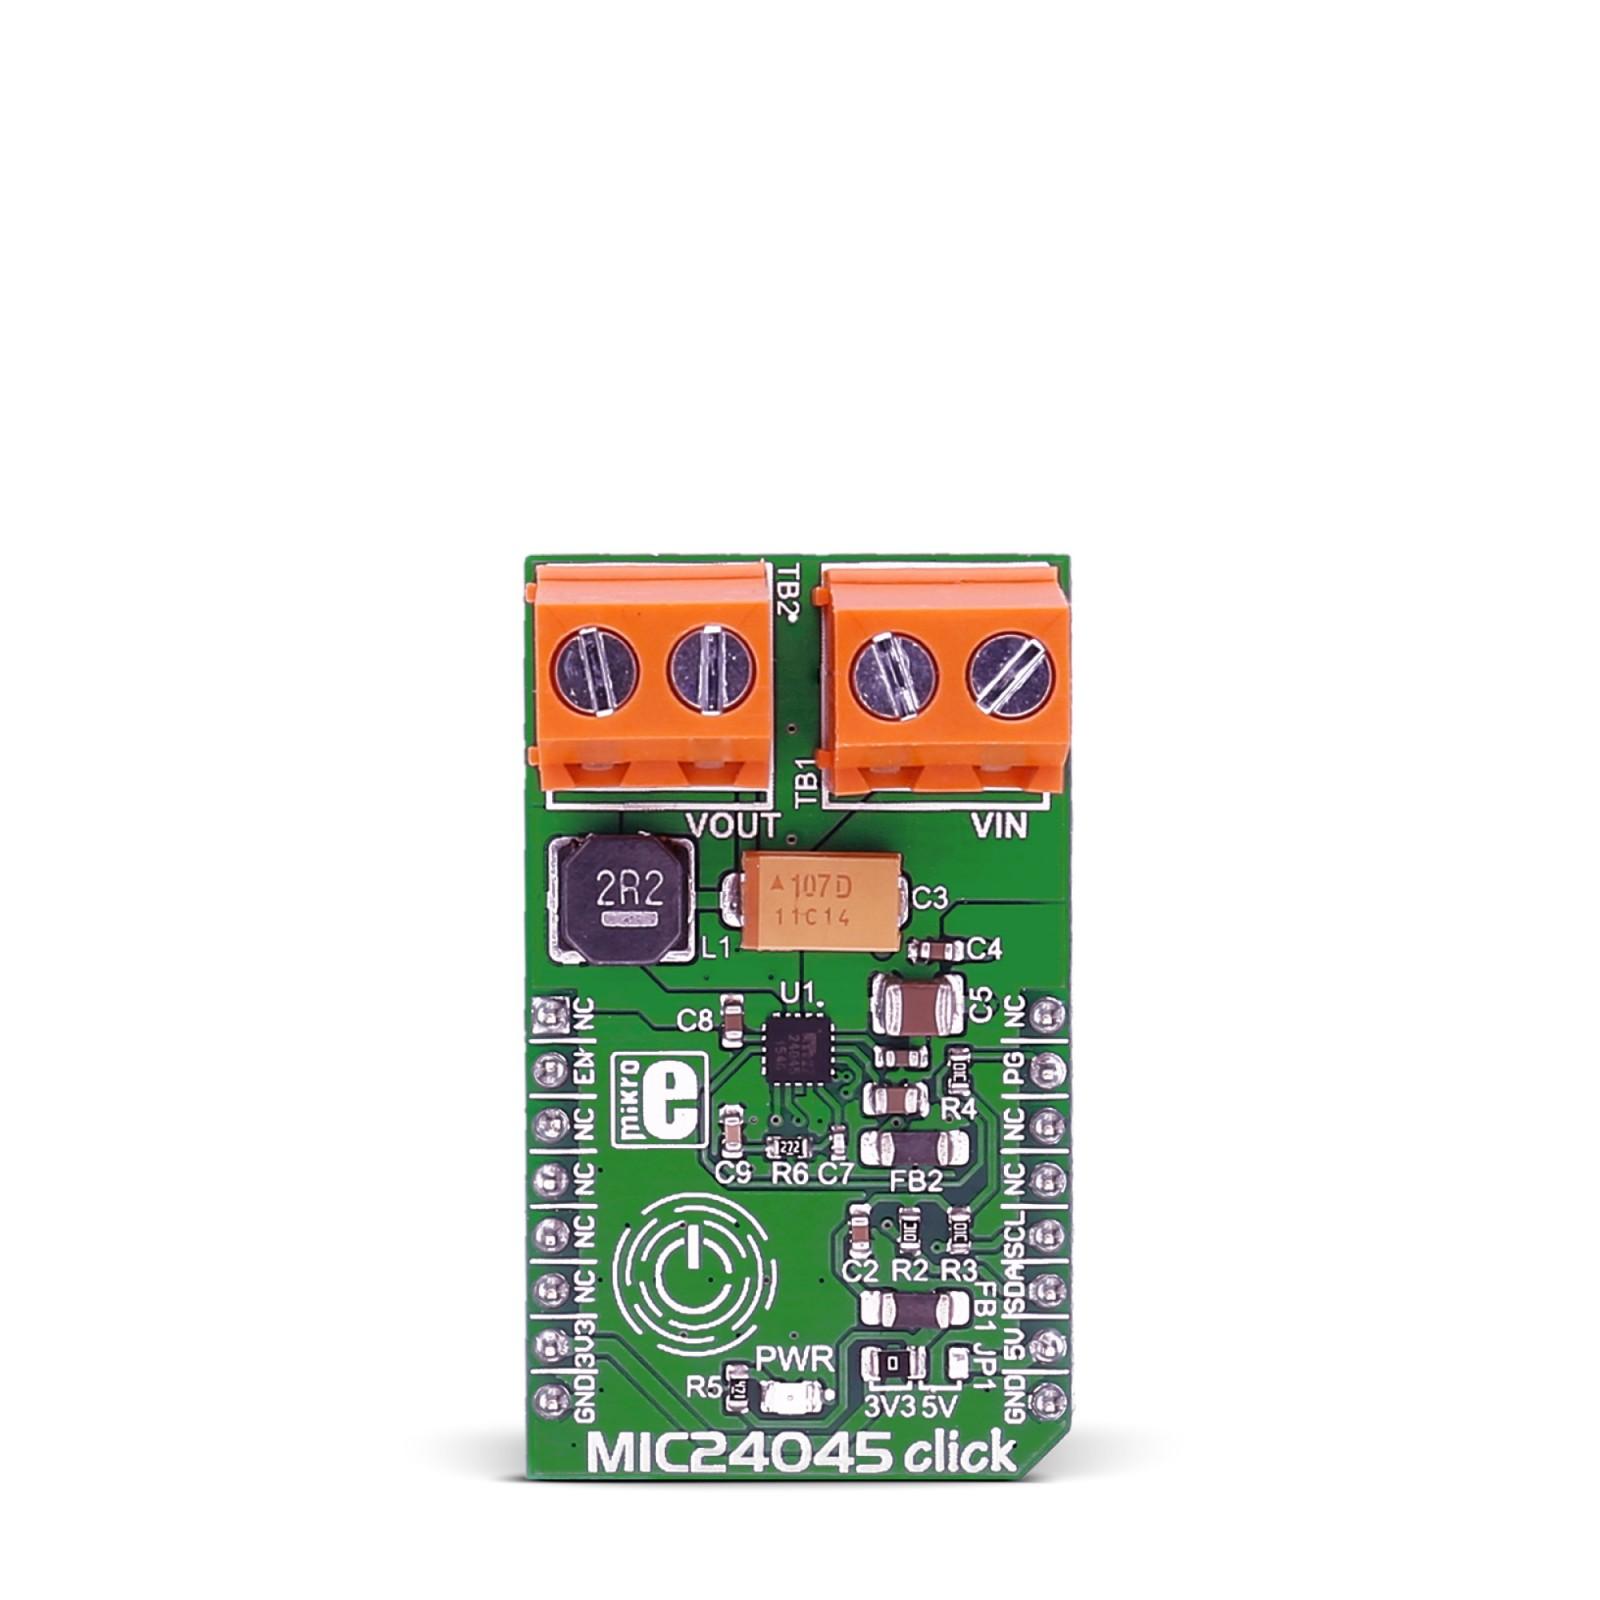 Mic24045 Click Board With Microchips Mikroelektronika Voltage Regulator Shutdown Digital Wiring Diagram Schematic Mgctlbxnmzp Mgctlbxv5112 Mgctlbxlc Mgctlbxpprestashop